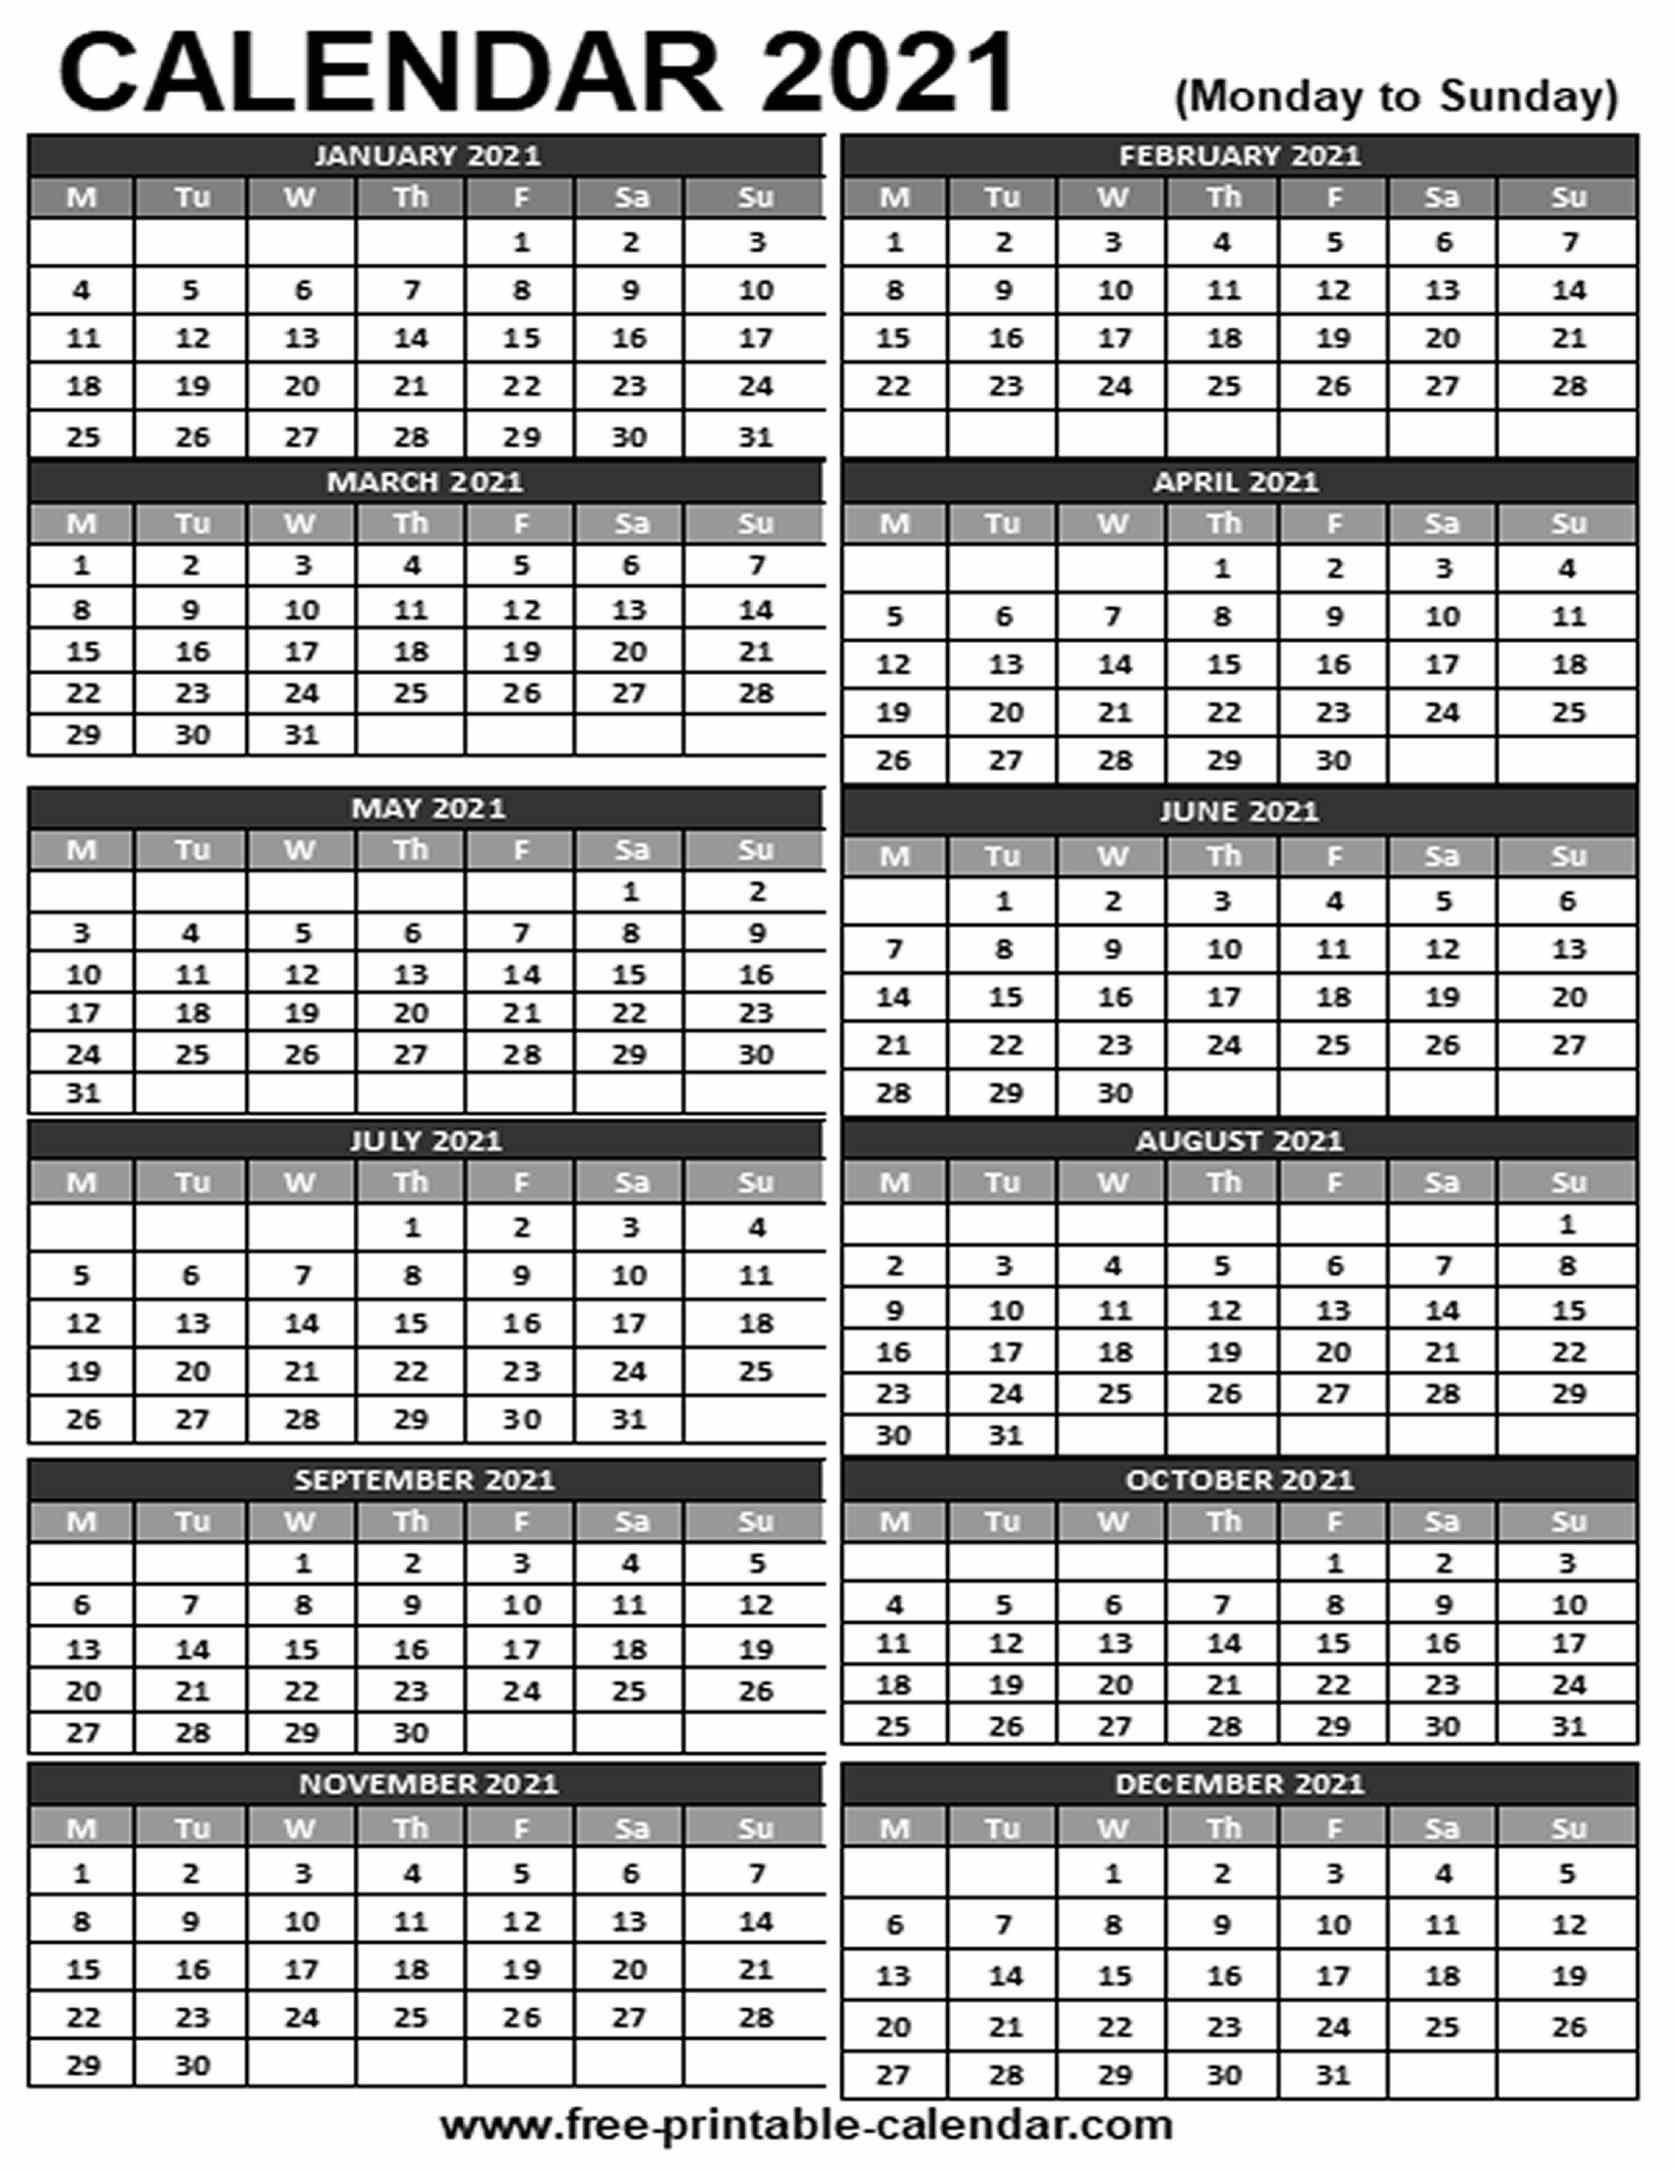 2021 Printable Calendar - Free-Printable-Calendar